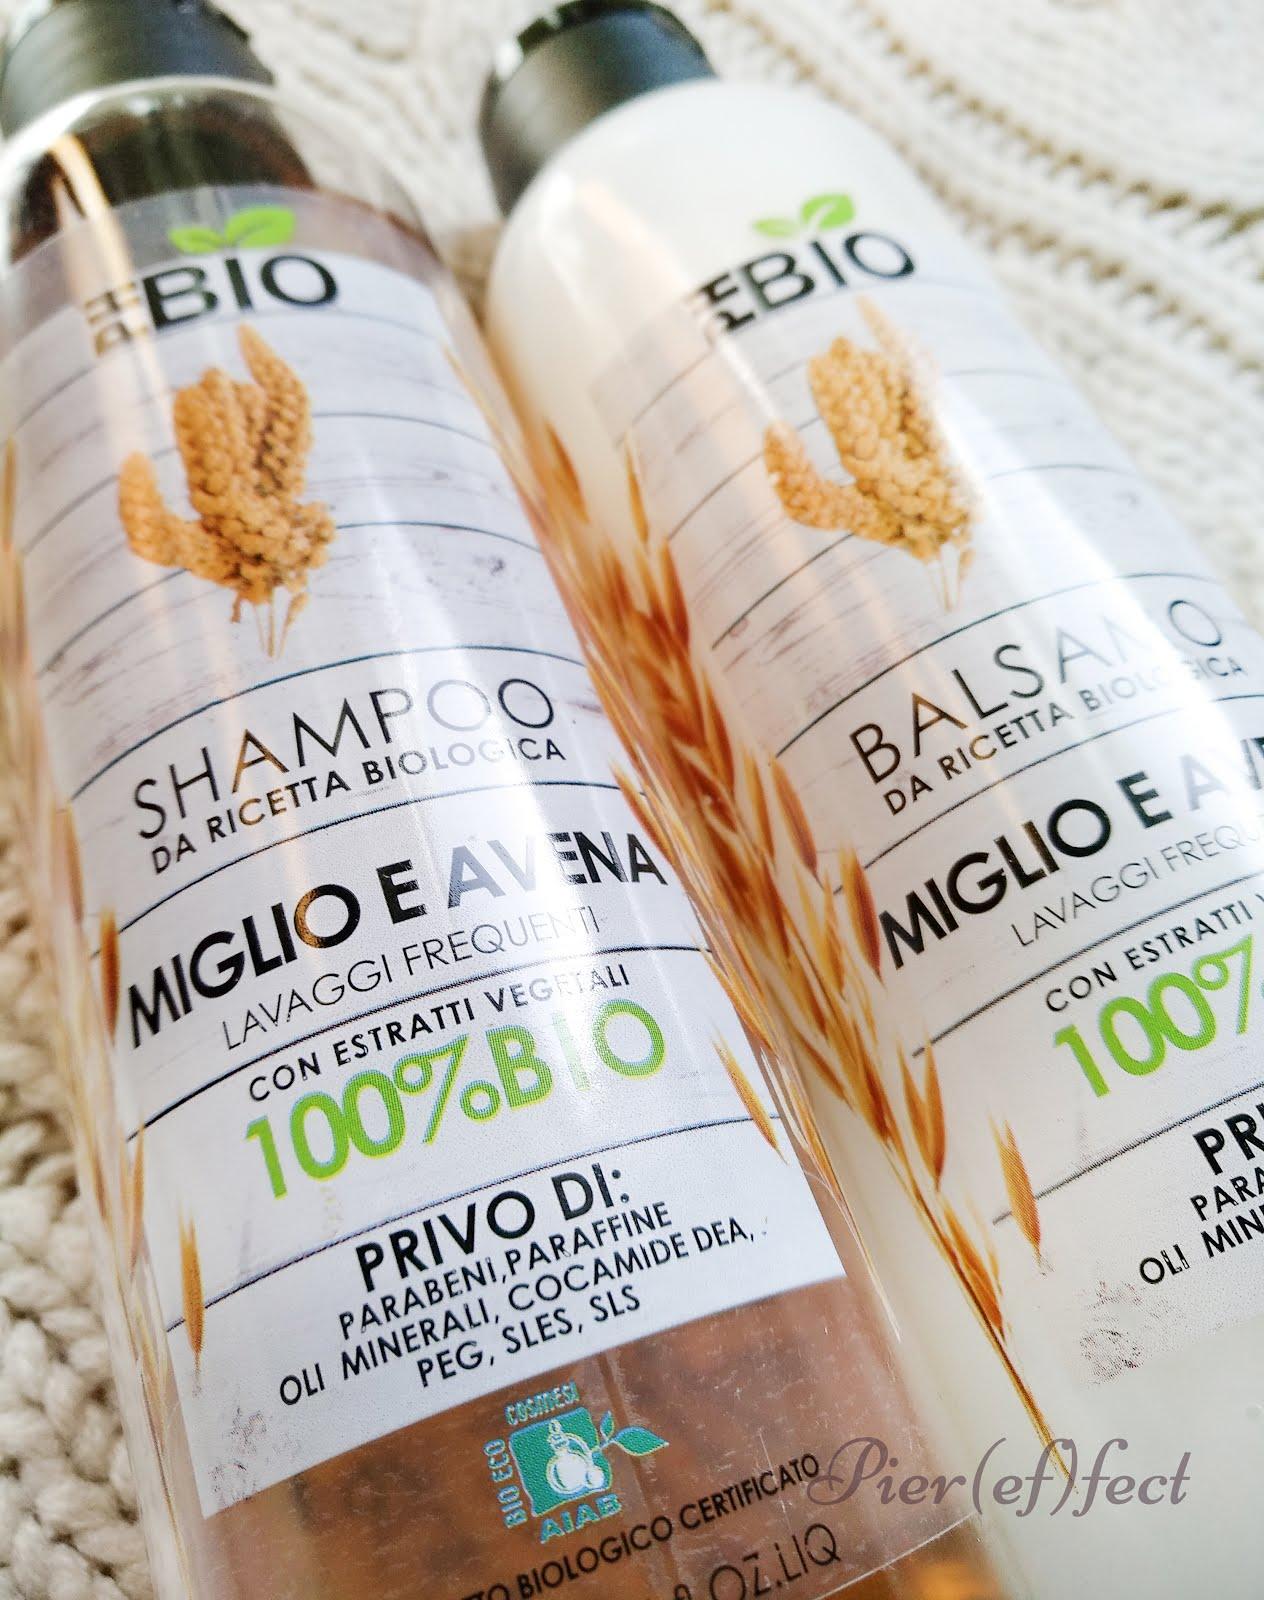 Balsamo shampoo phbio lidl